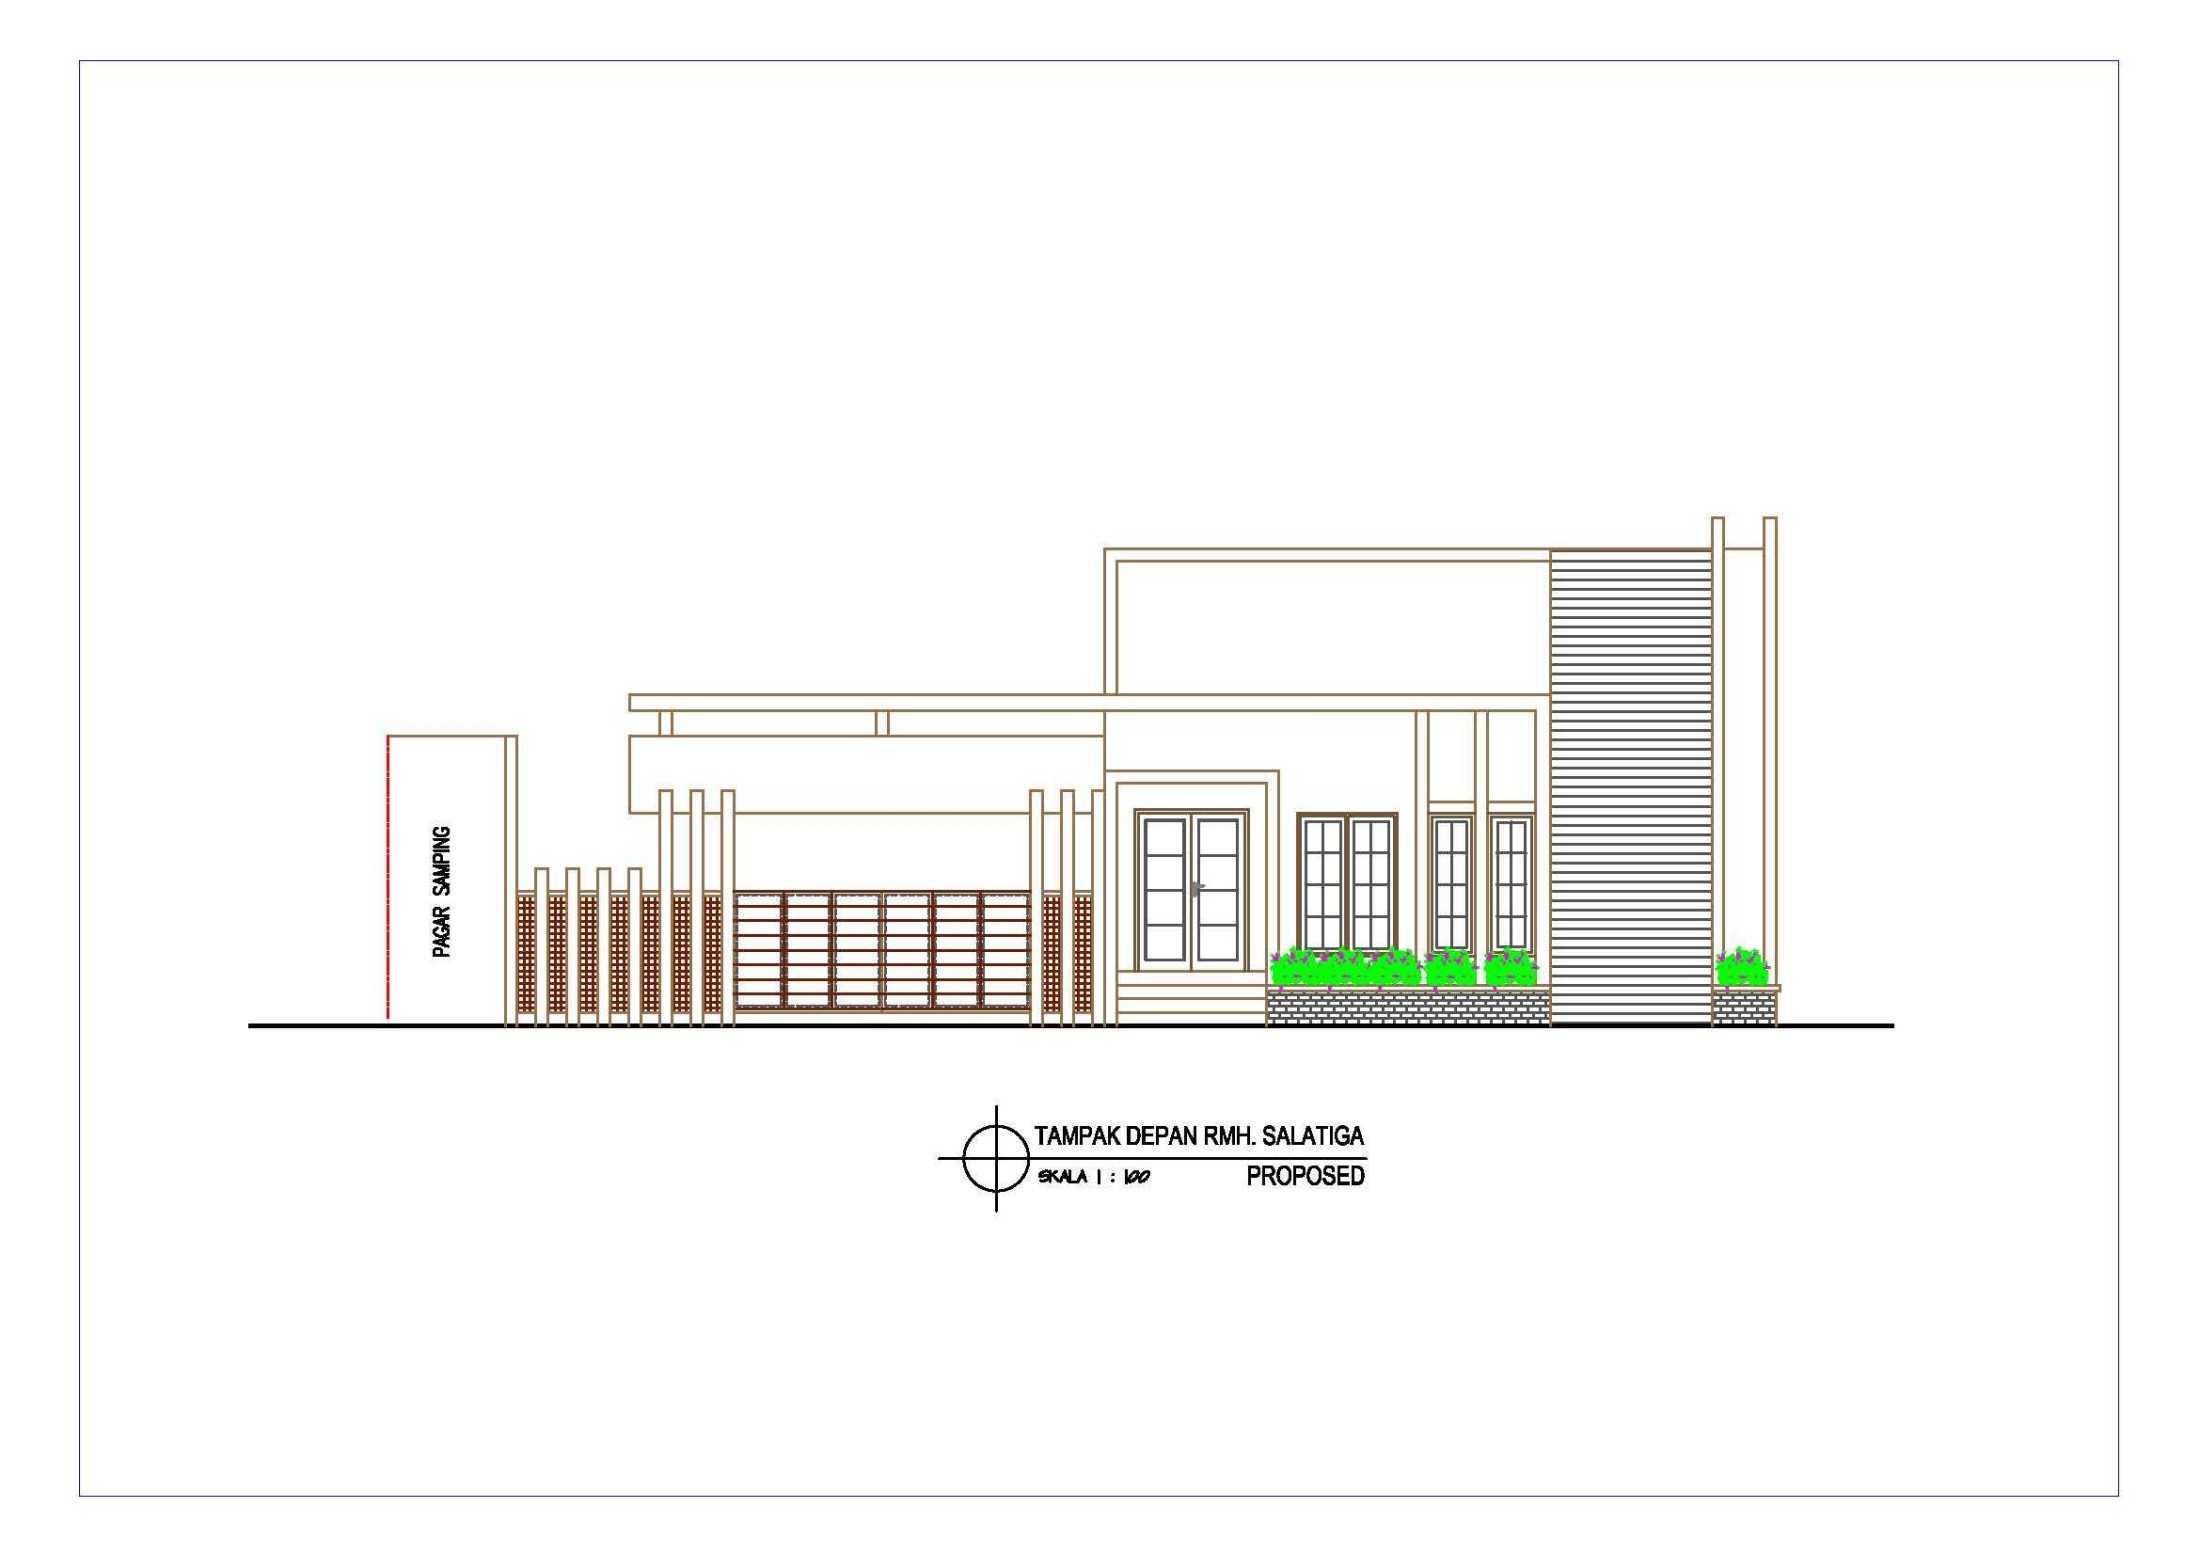 Compact Studio & Works Rumah Salatiga Salatiga, Kota Salatiga, Jawa Tengah, Indonesia Salatiga, Kota Salatiga, Jawa Tengah, Indonesia Compact-Studio-Rumah-Salatiga  114382